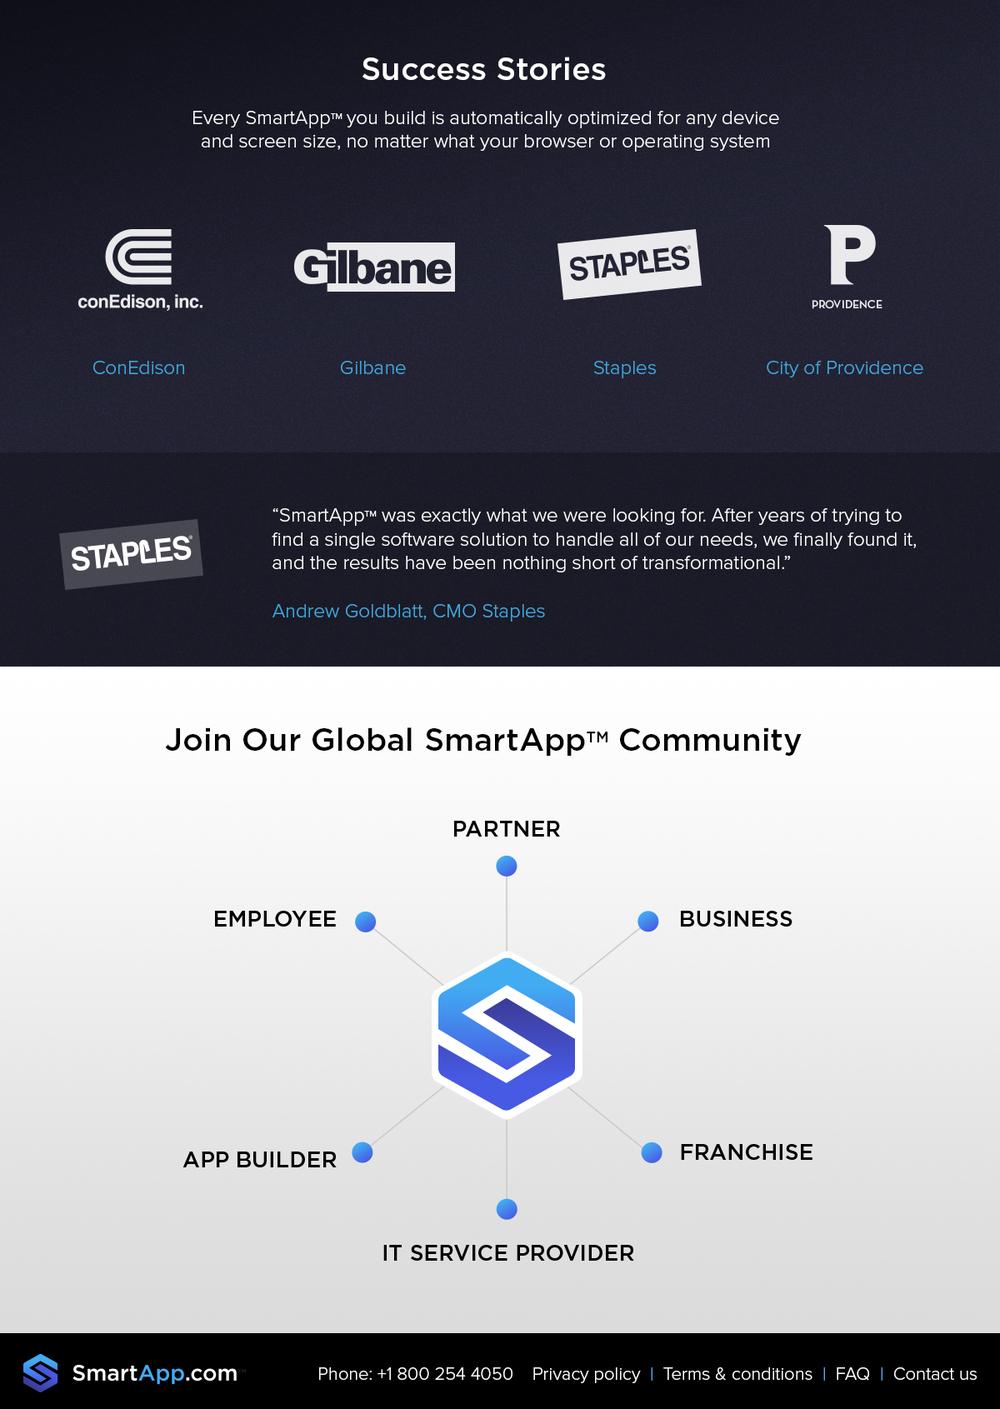 smartapp-home_05.jpg